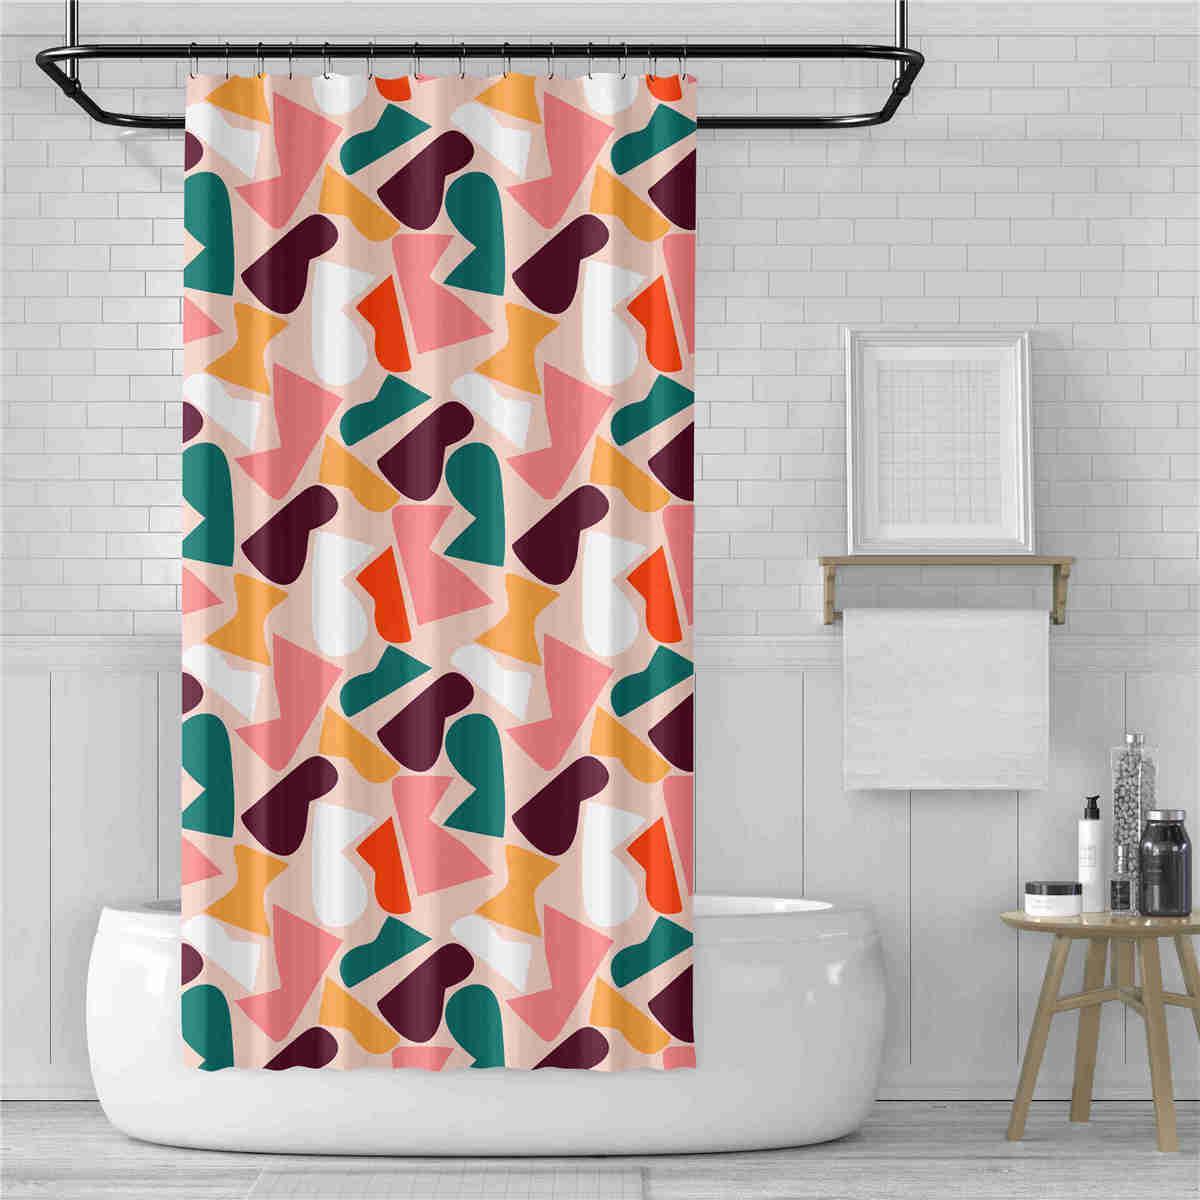 1Pc Waterproof Fabric Polyester Random Pattern /& Hooks Bathroom Shower Curtain